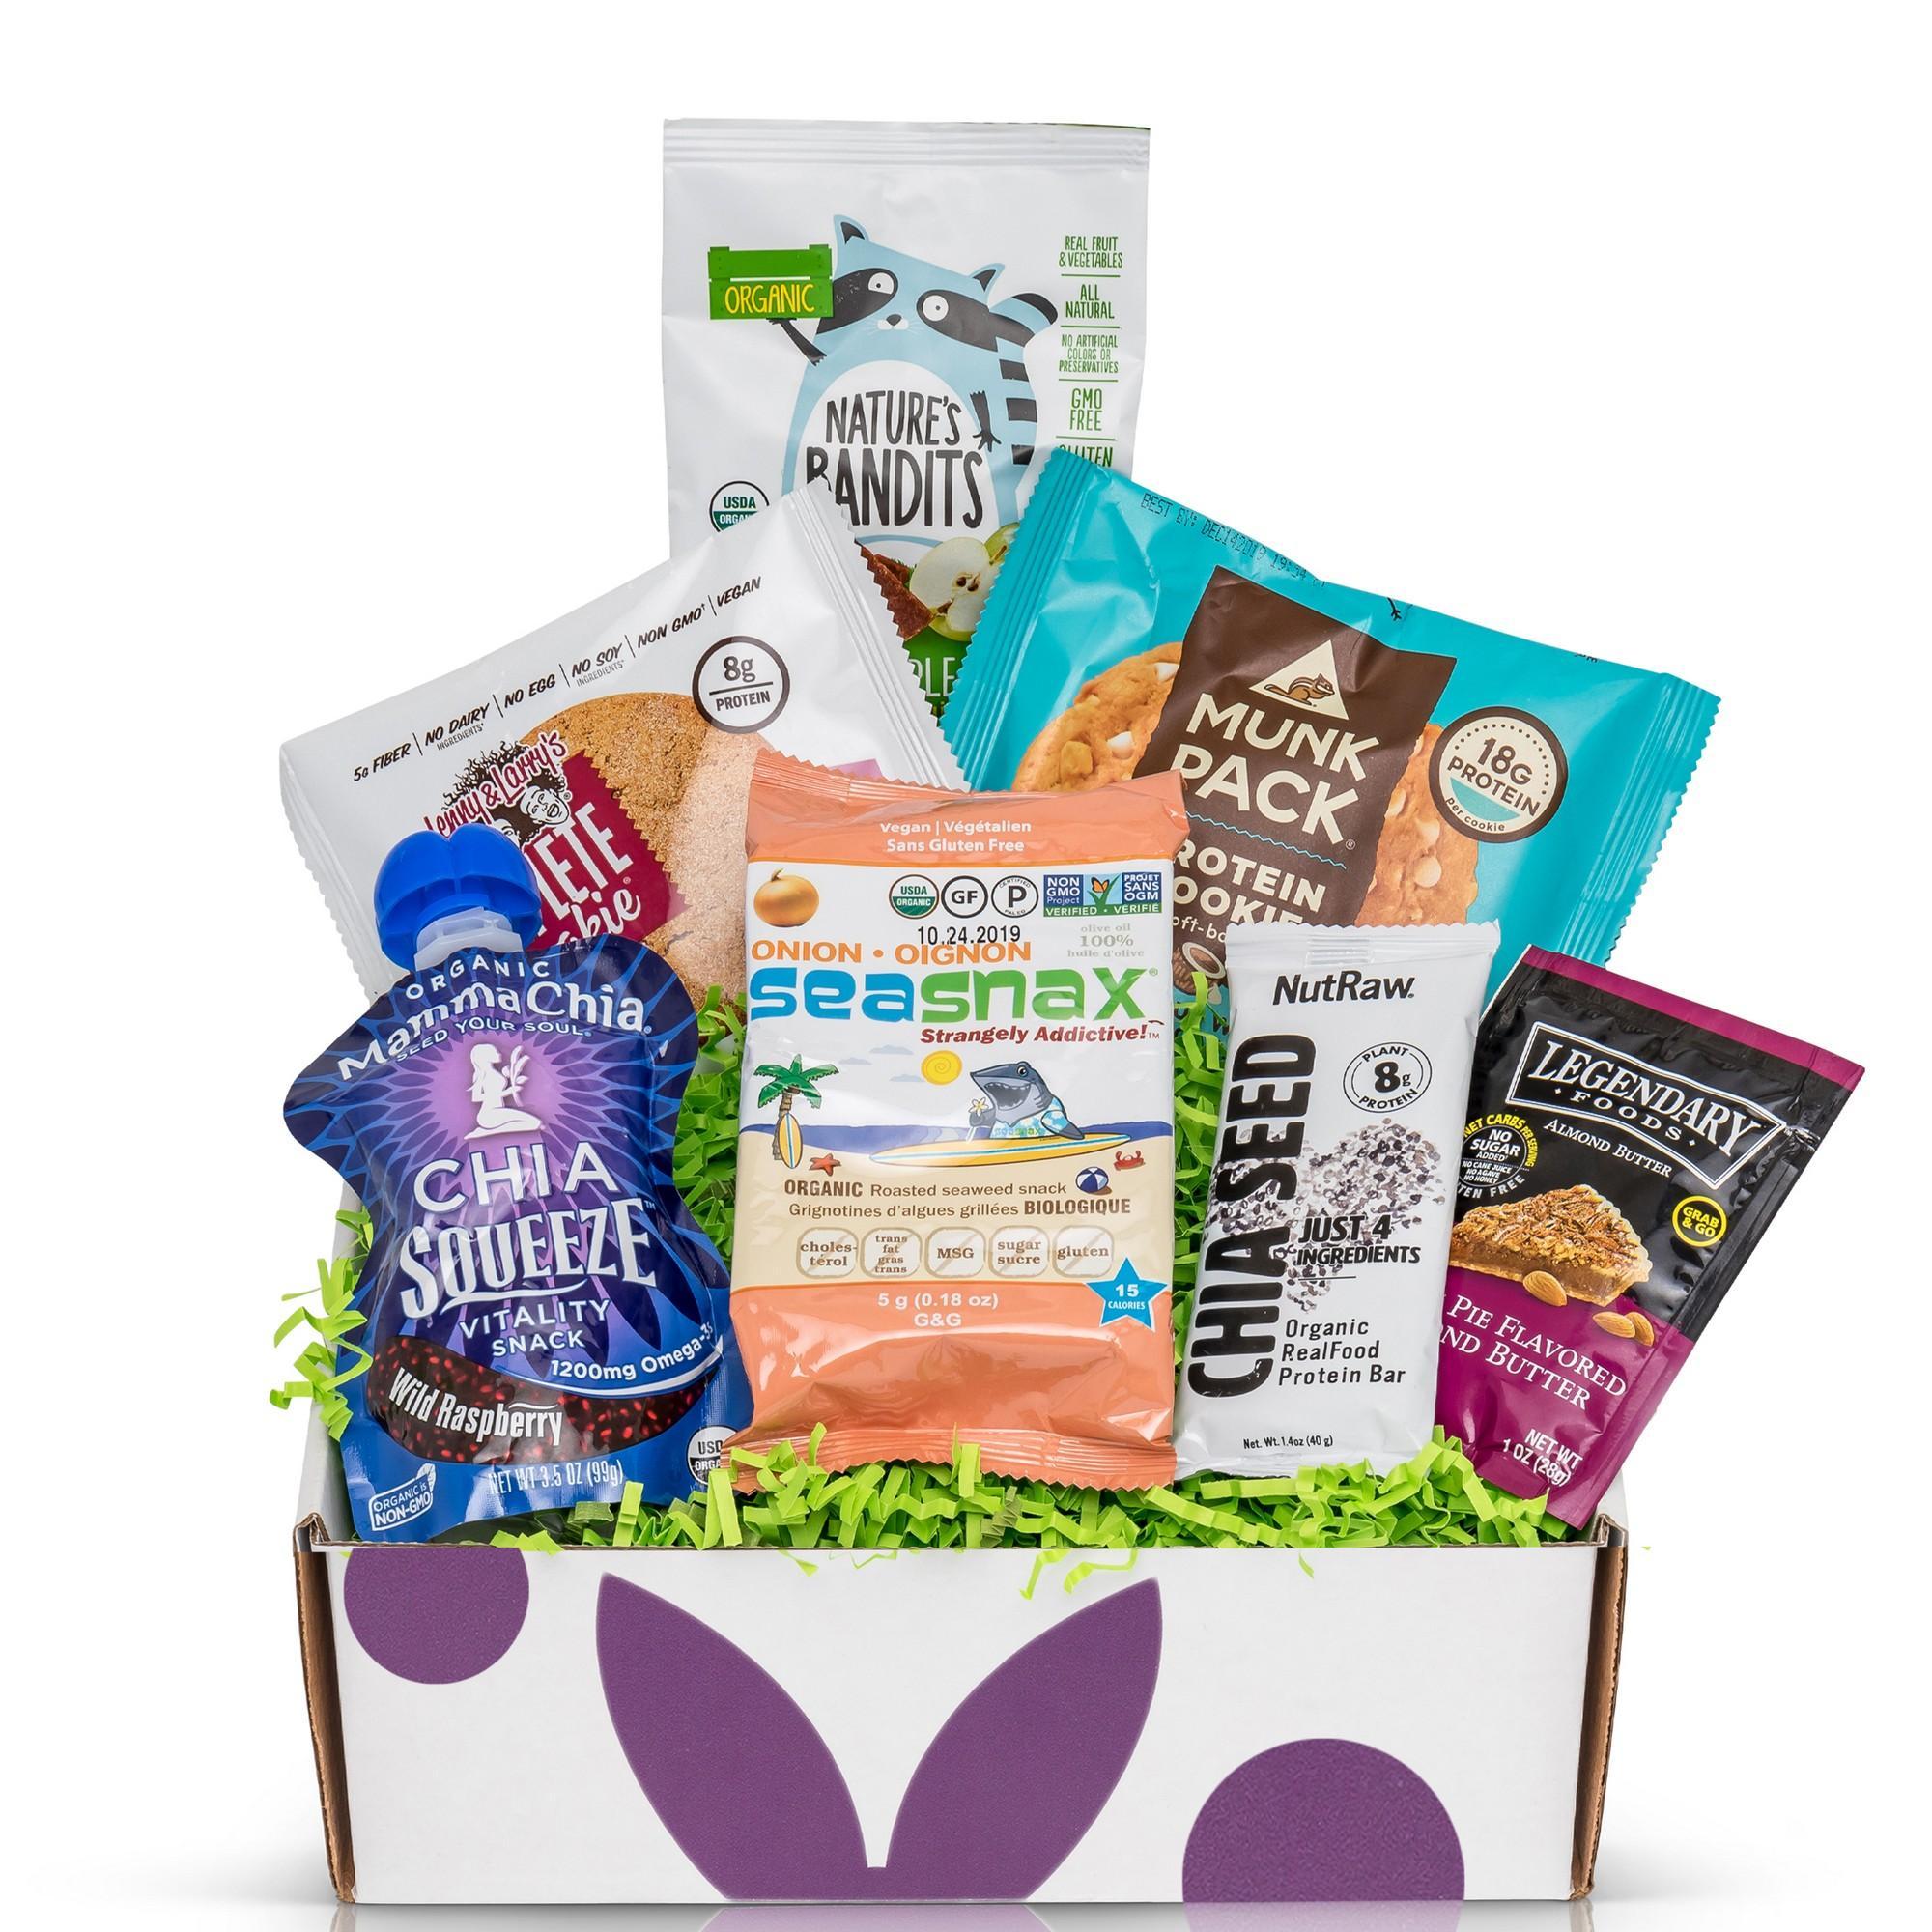 Bunny James Boxes - Vegan Snack Subscription: 7 snacks